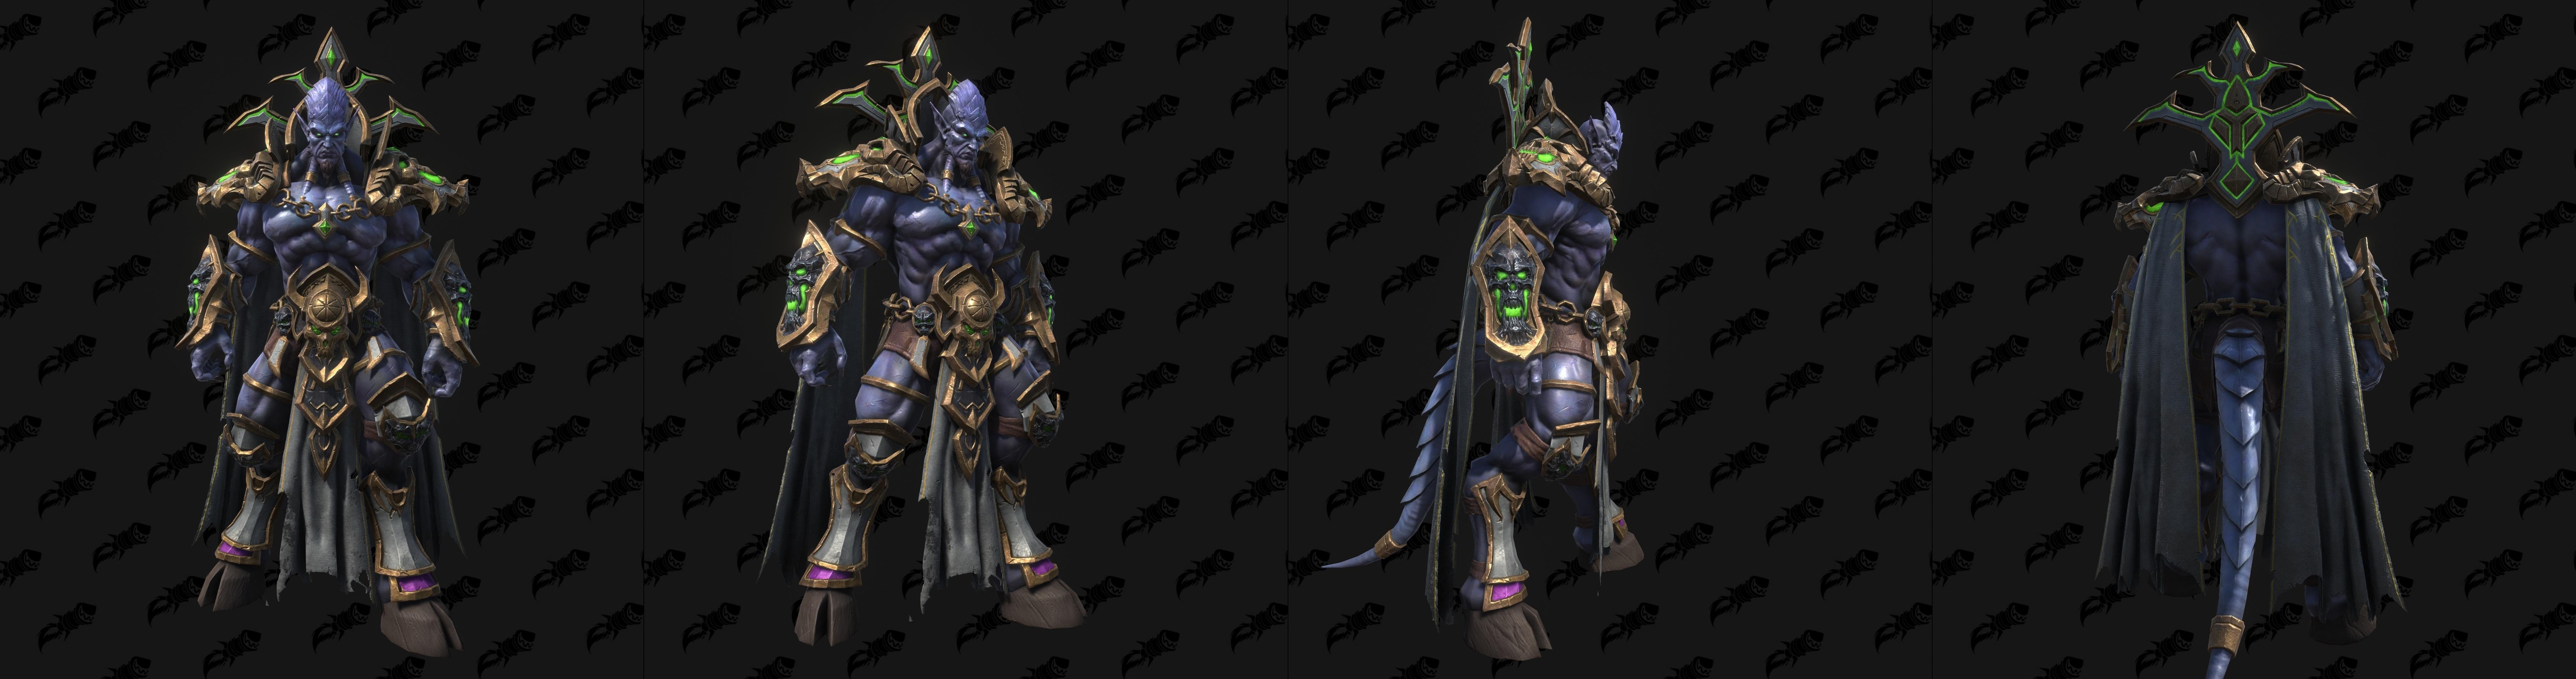 Warcraft III: Reforged Demon Models - Archimonde, Corrupted